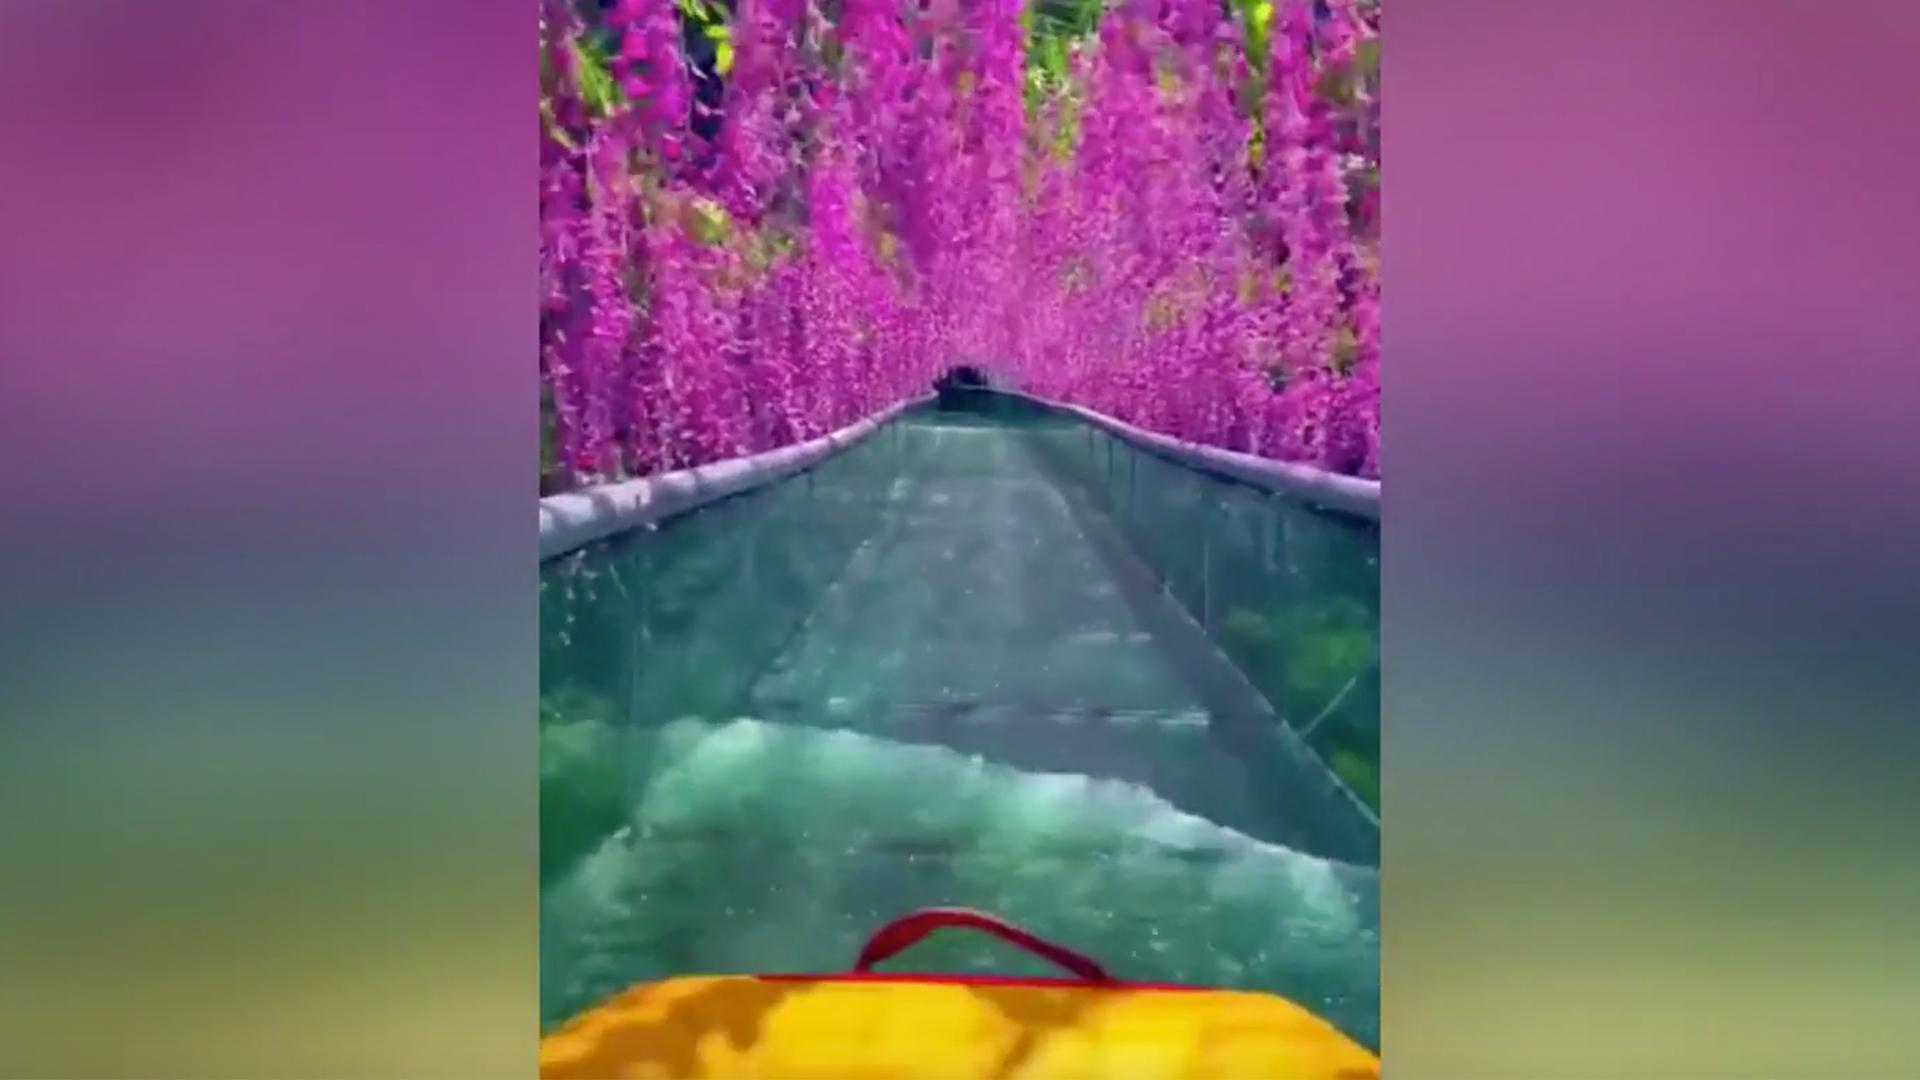 Floating under flowers